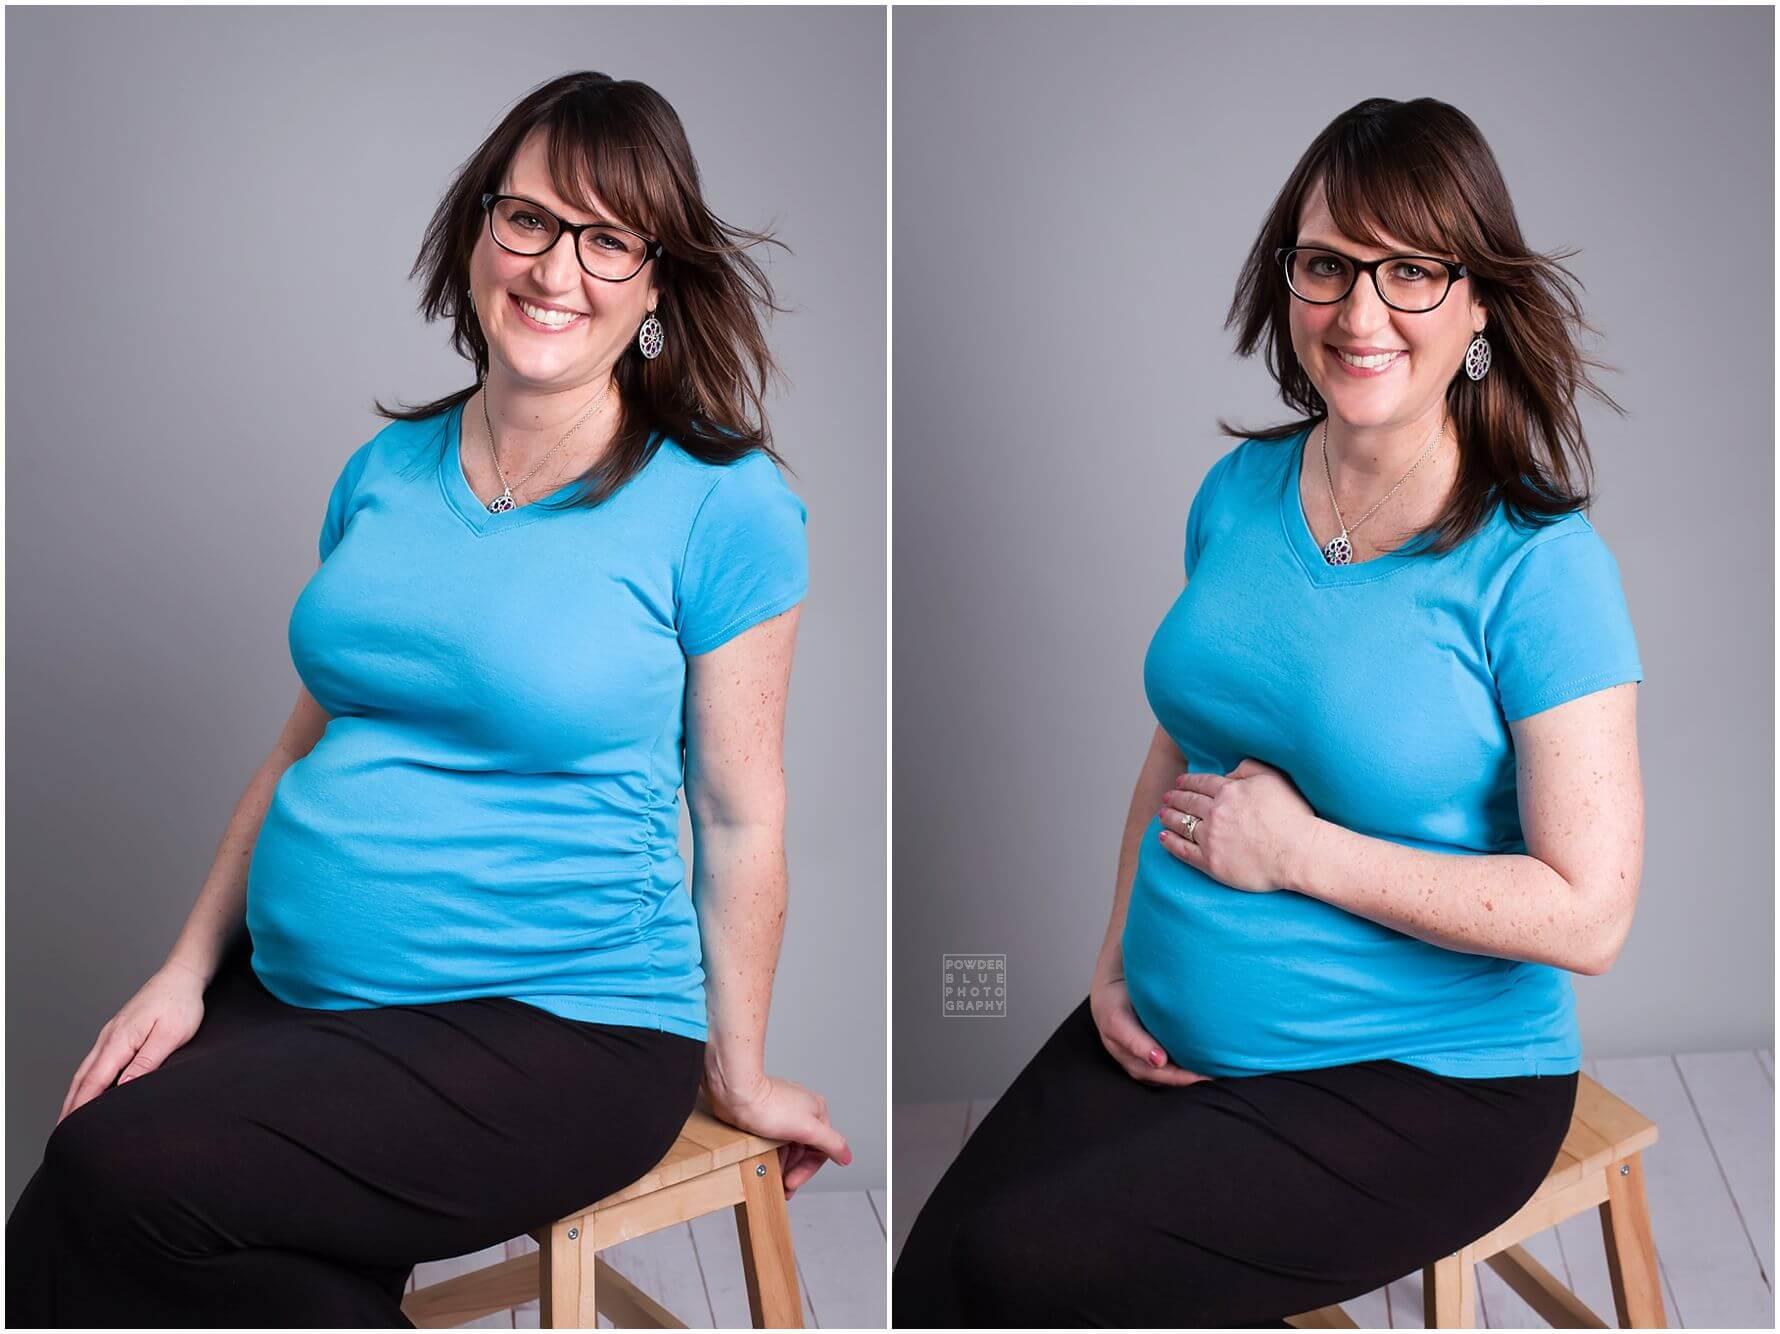 Pittsburgh Maternity Photographer | Maternity Studio Mini Session | L Family